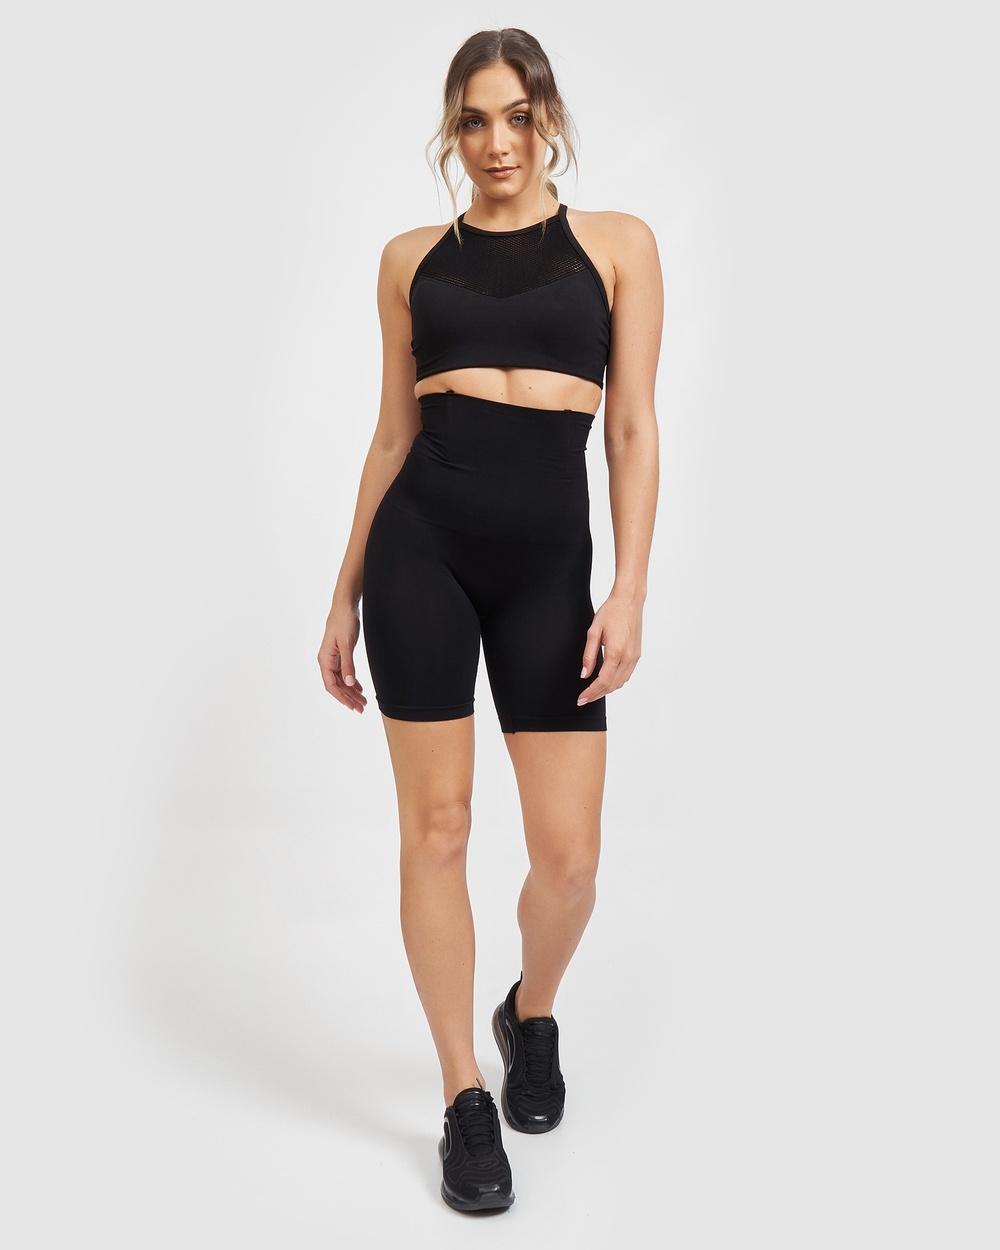 Core Trainer High Waisted Shape Wear Midi Shorts Lingerie Black Australia